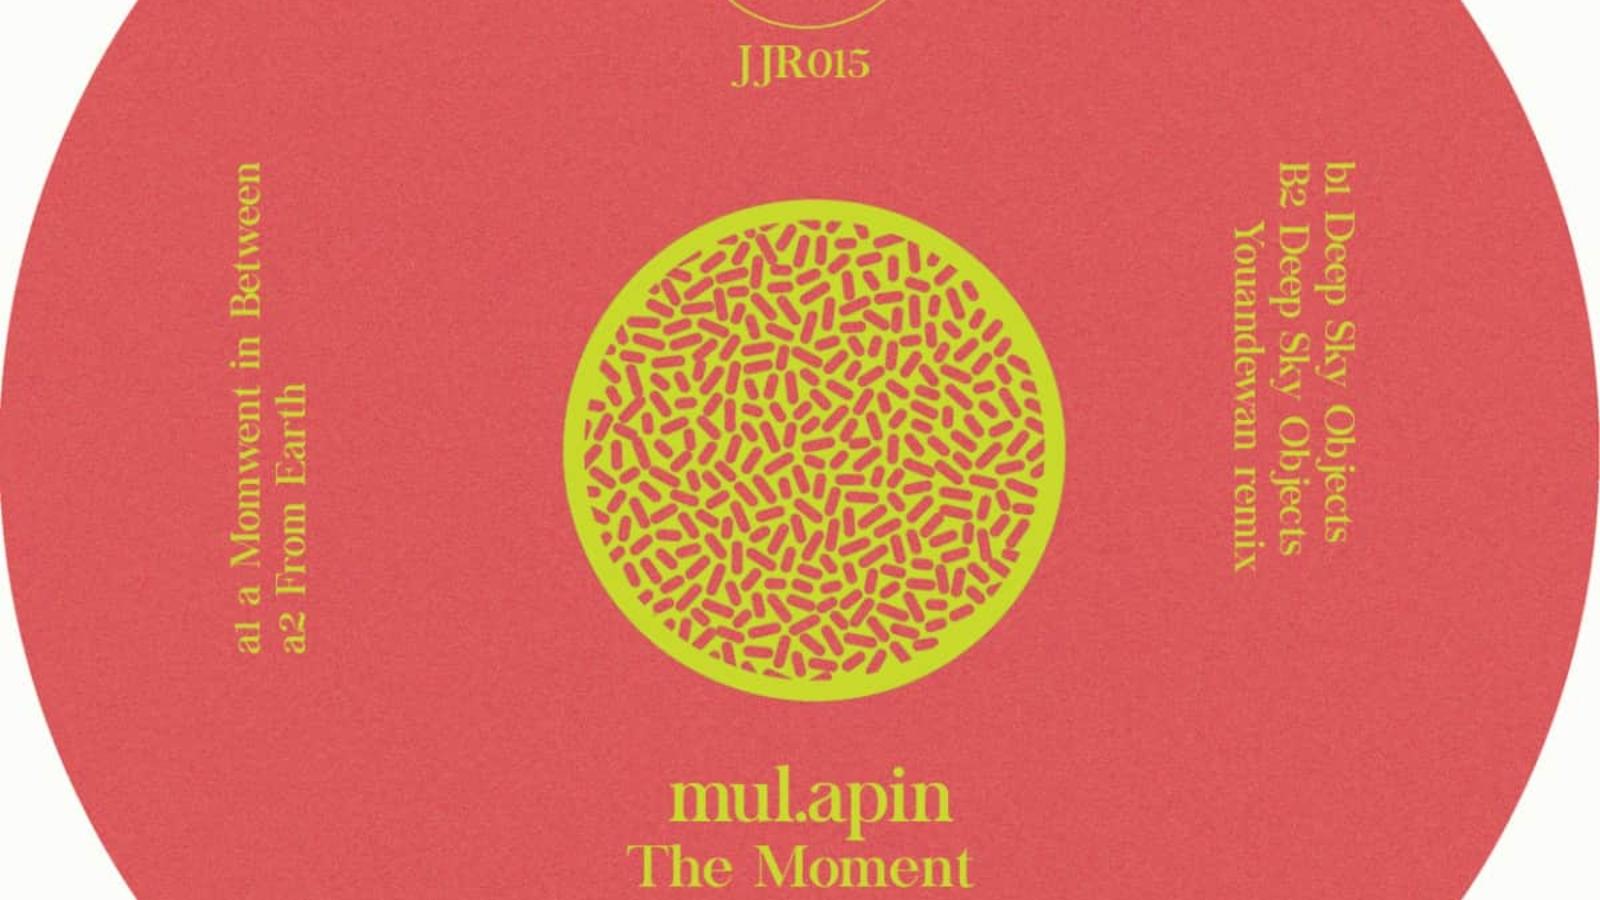 jjr015_sticker1-1200x1200